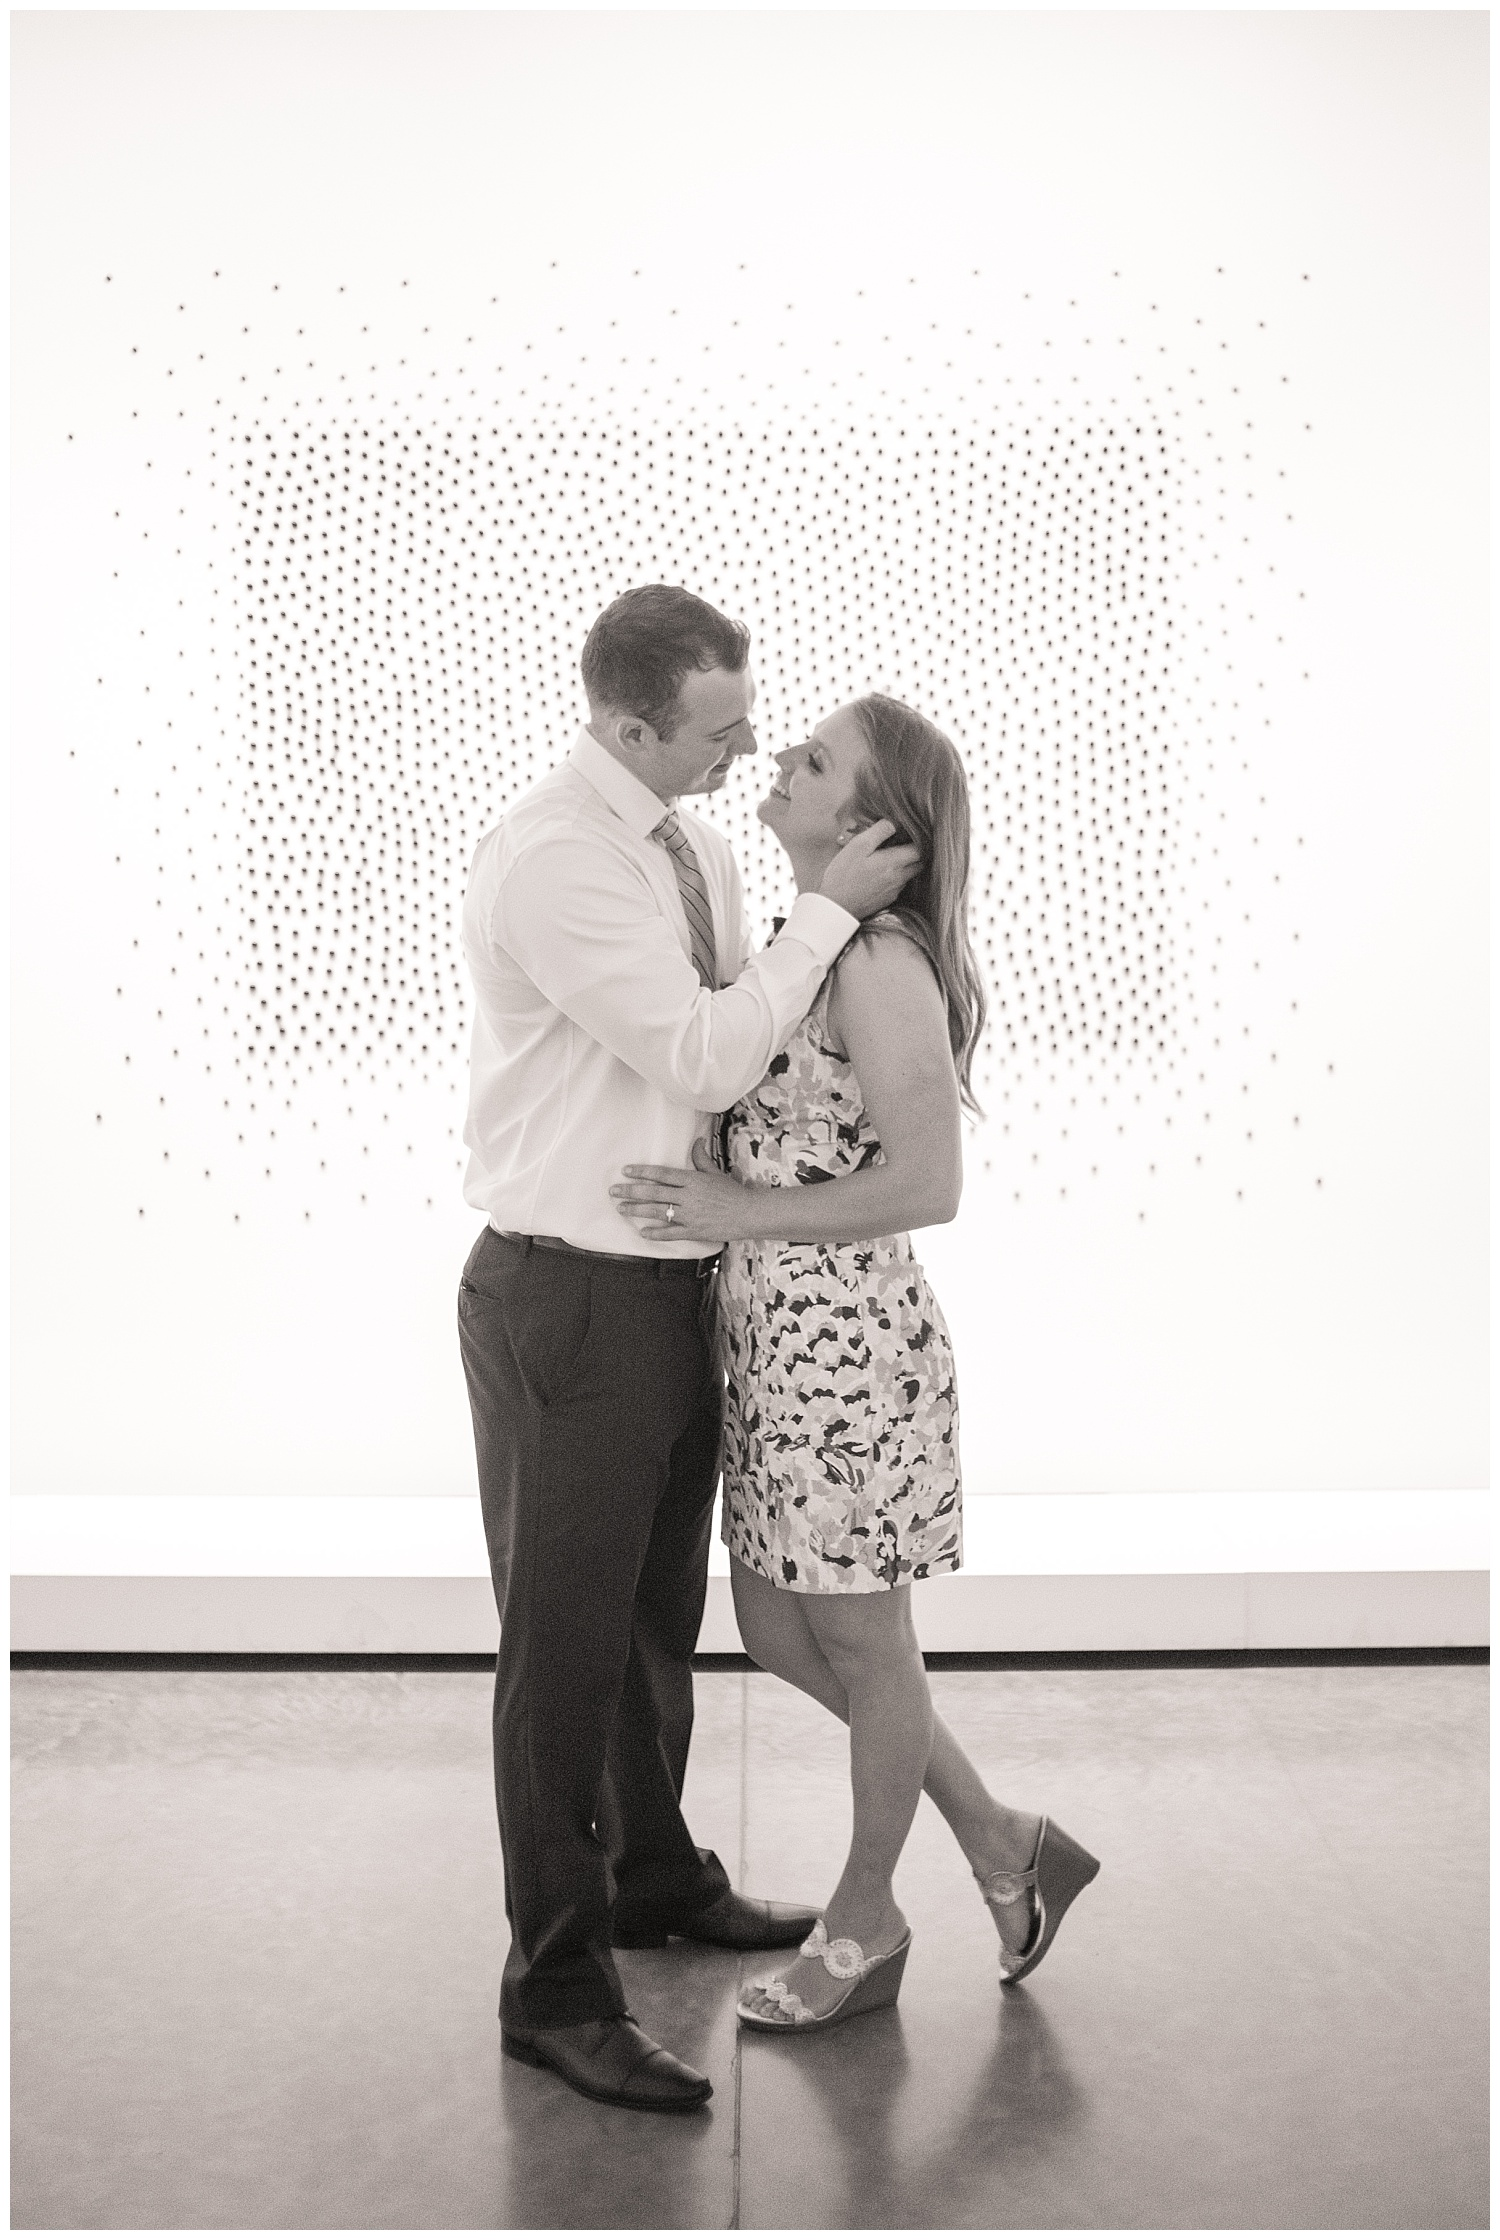 MJMP Richmond Wedding Photographer Summer Virginia State Capitol Engagement Session_0025.jpg